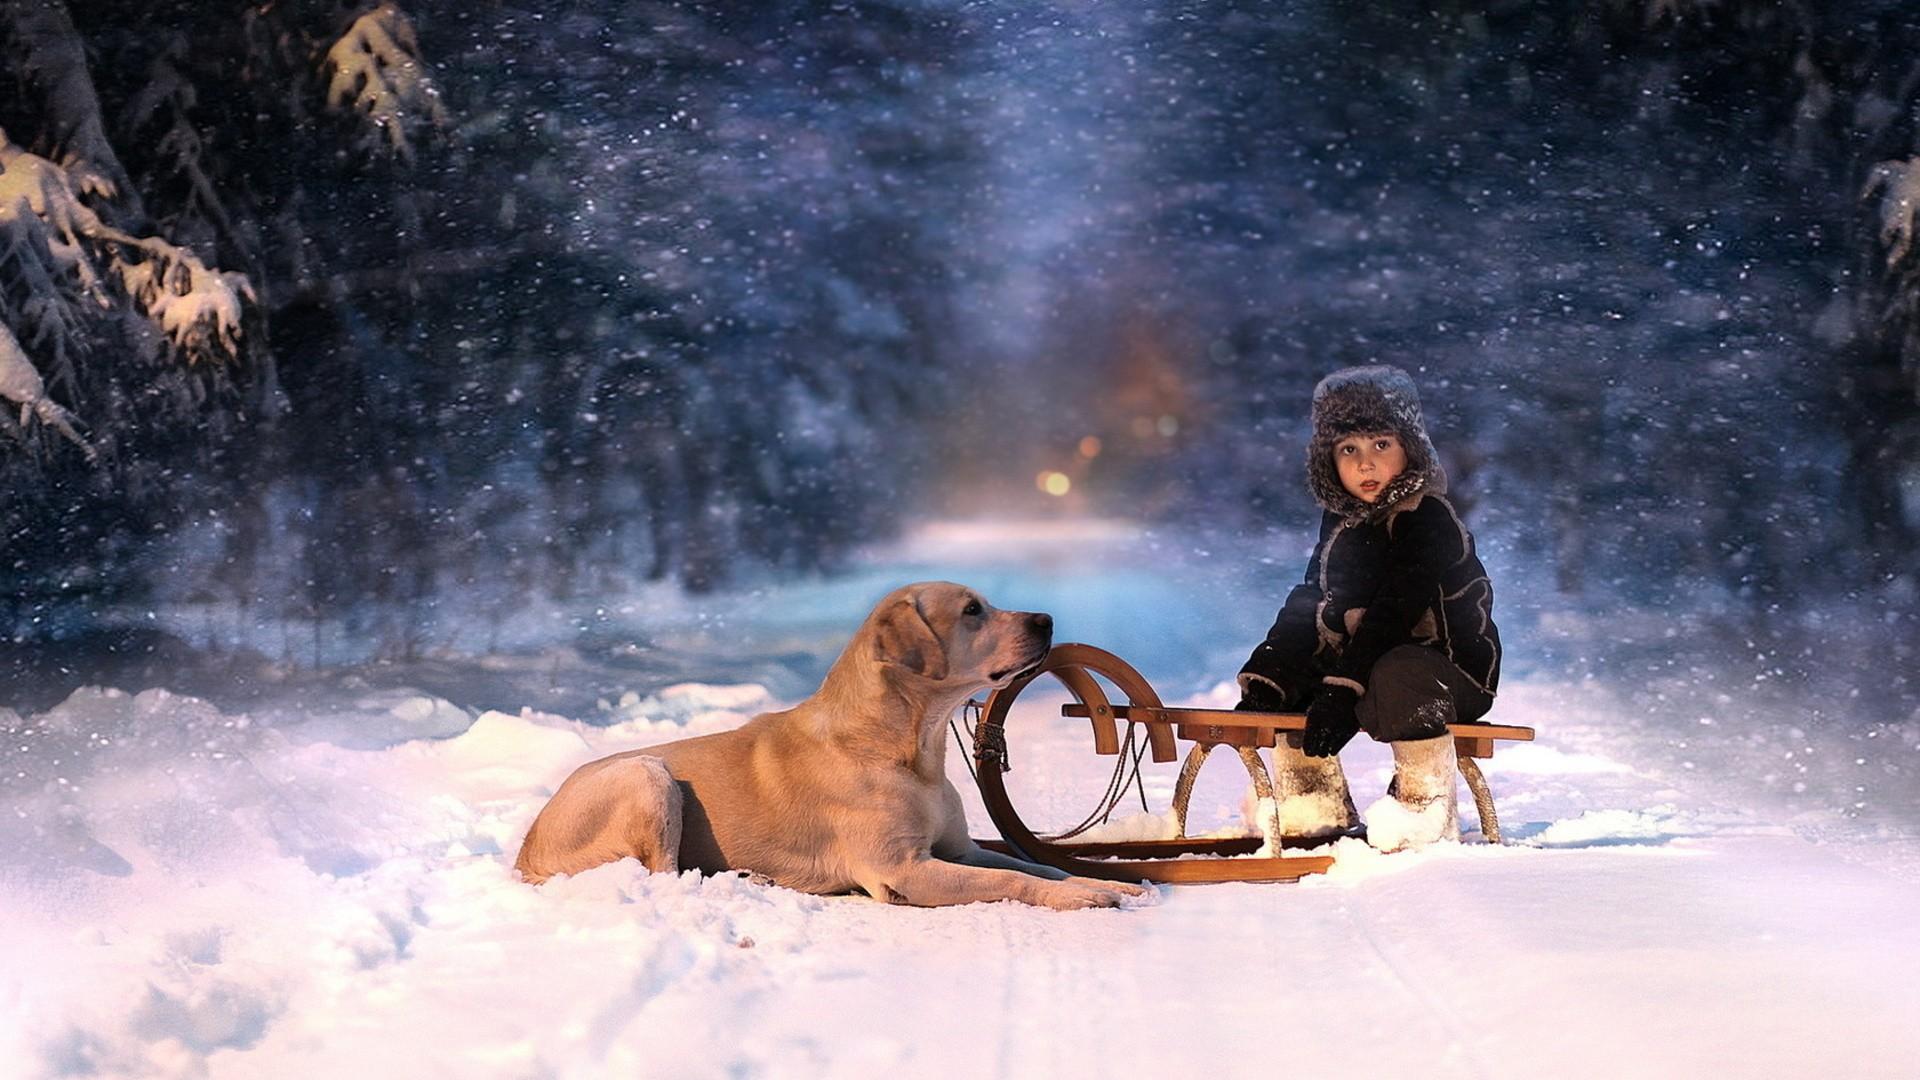 Zastaki.com - Собака и ребенок на санках